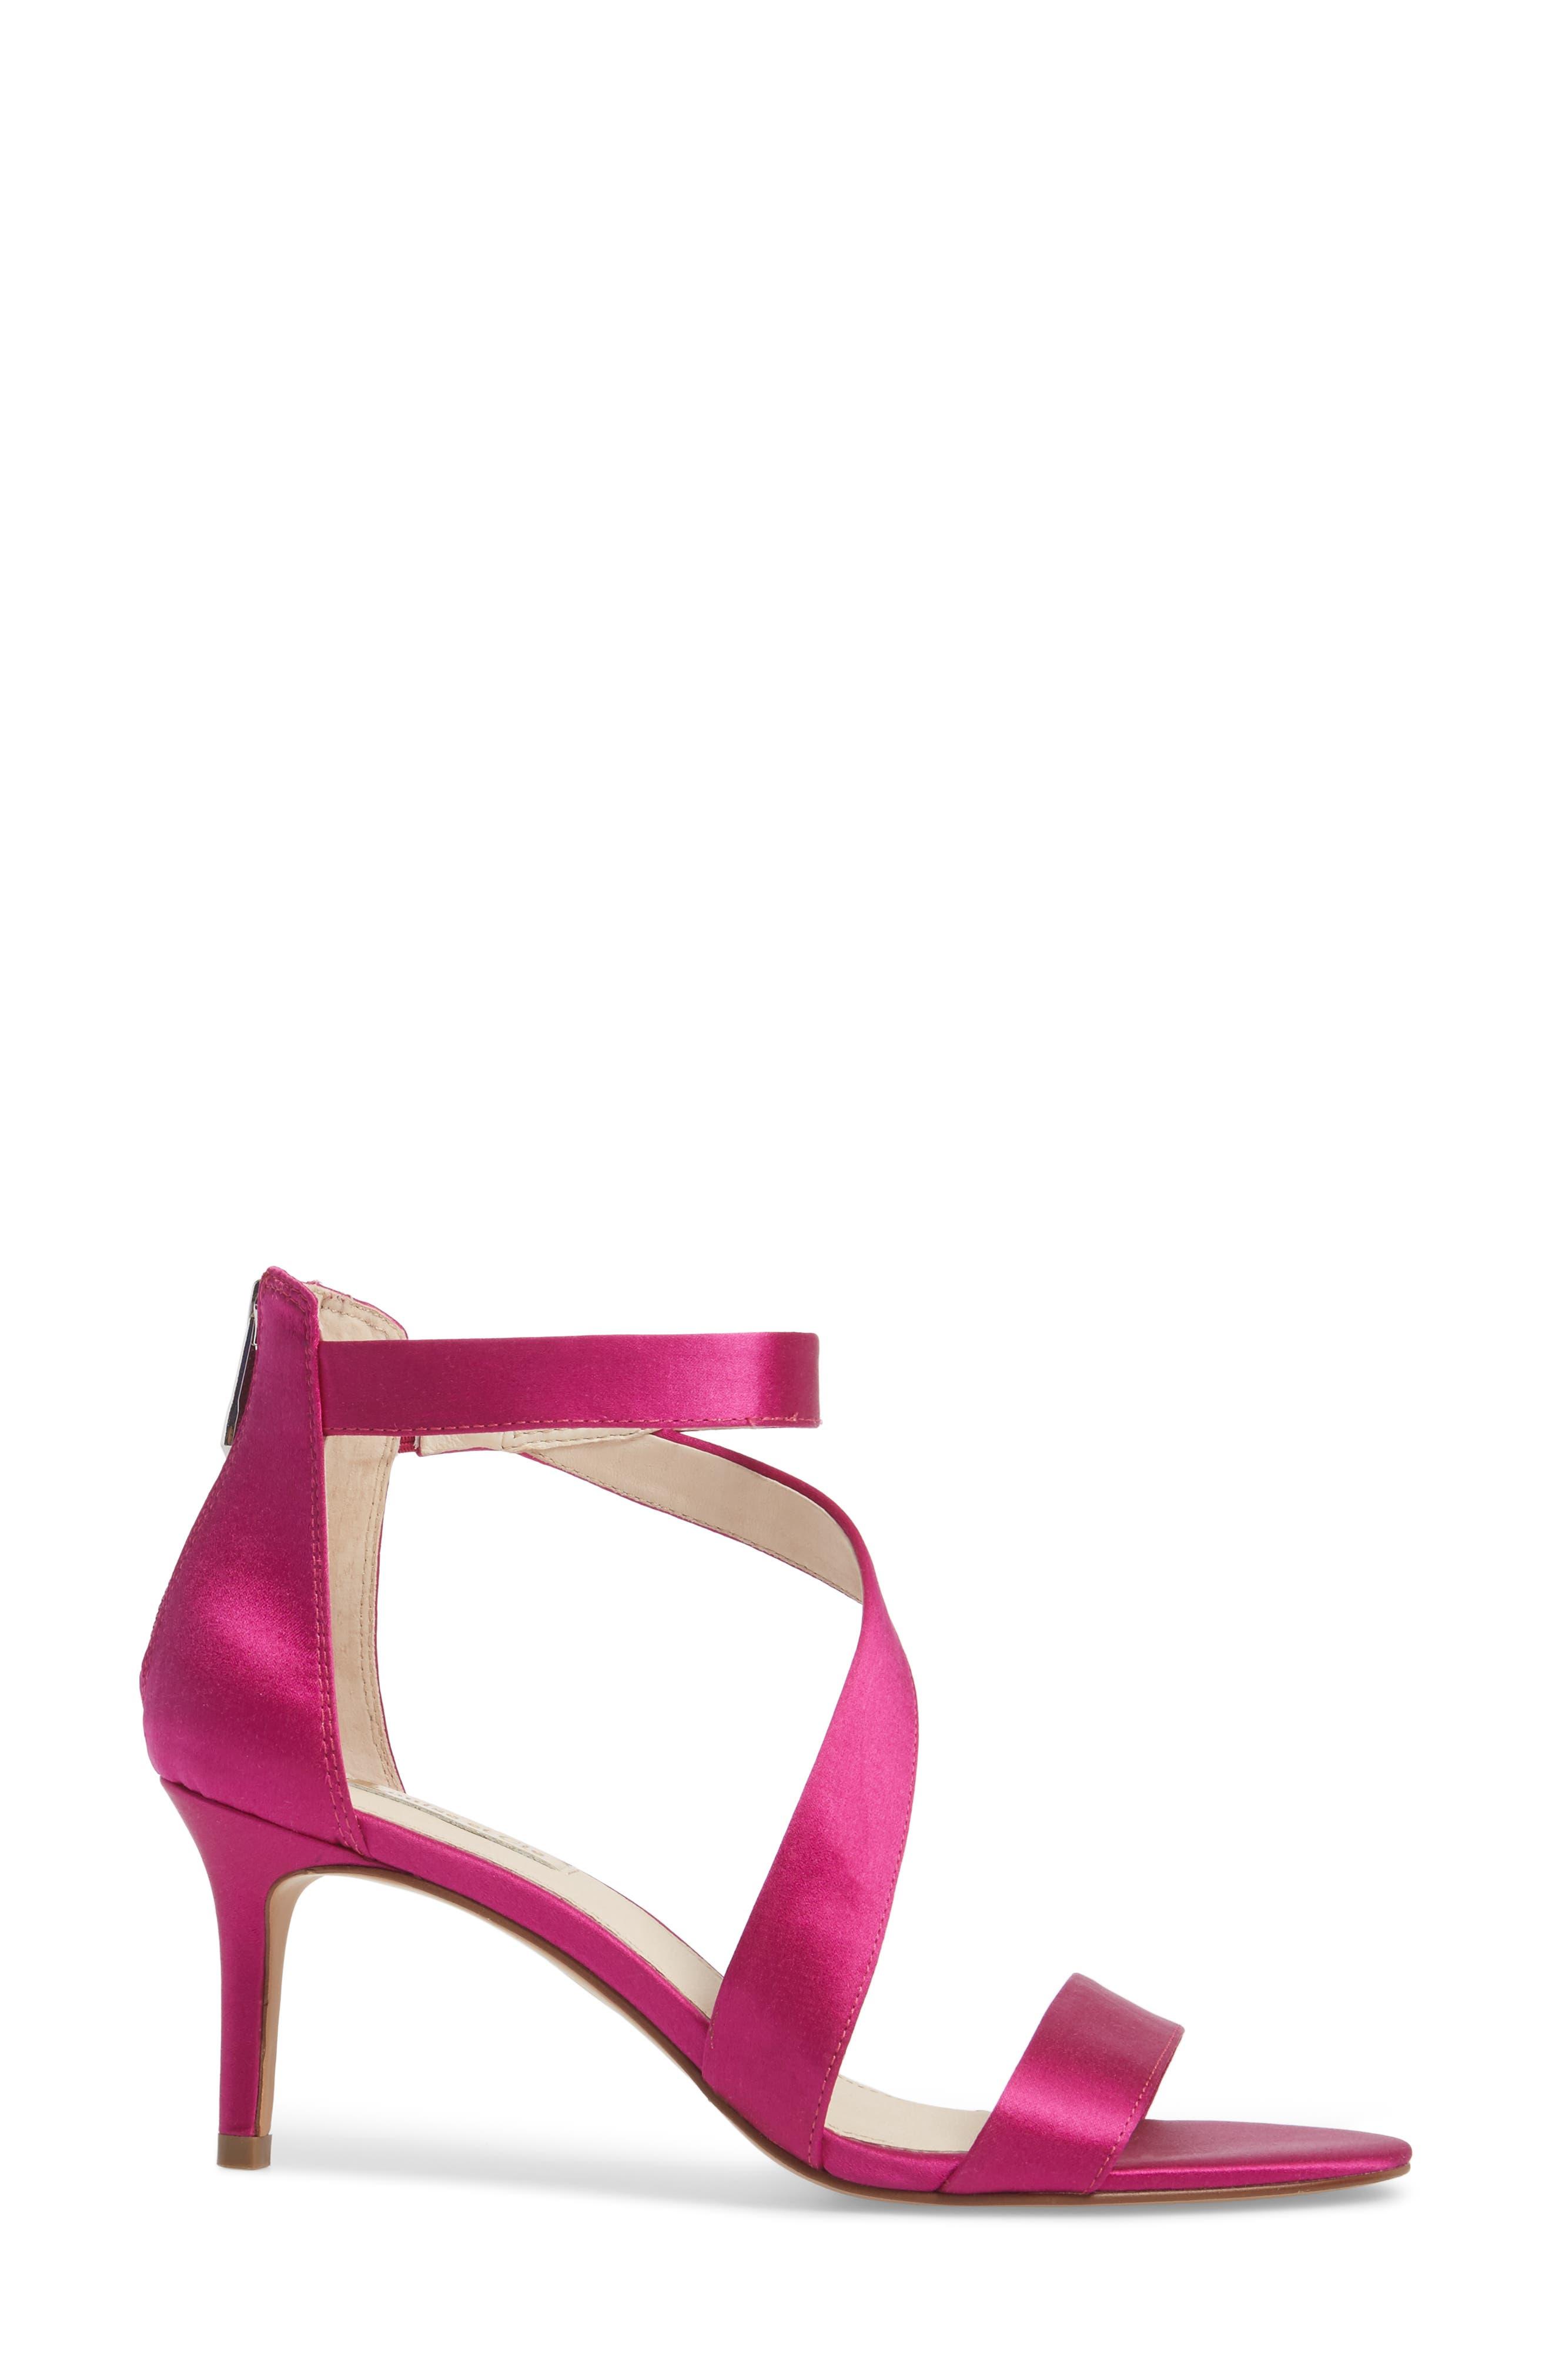 Hilio Sandal,                             Alternate thumbnail 3, color,                             Electric Pink Satin